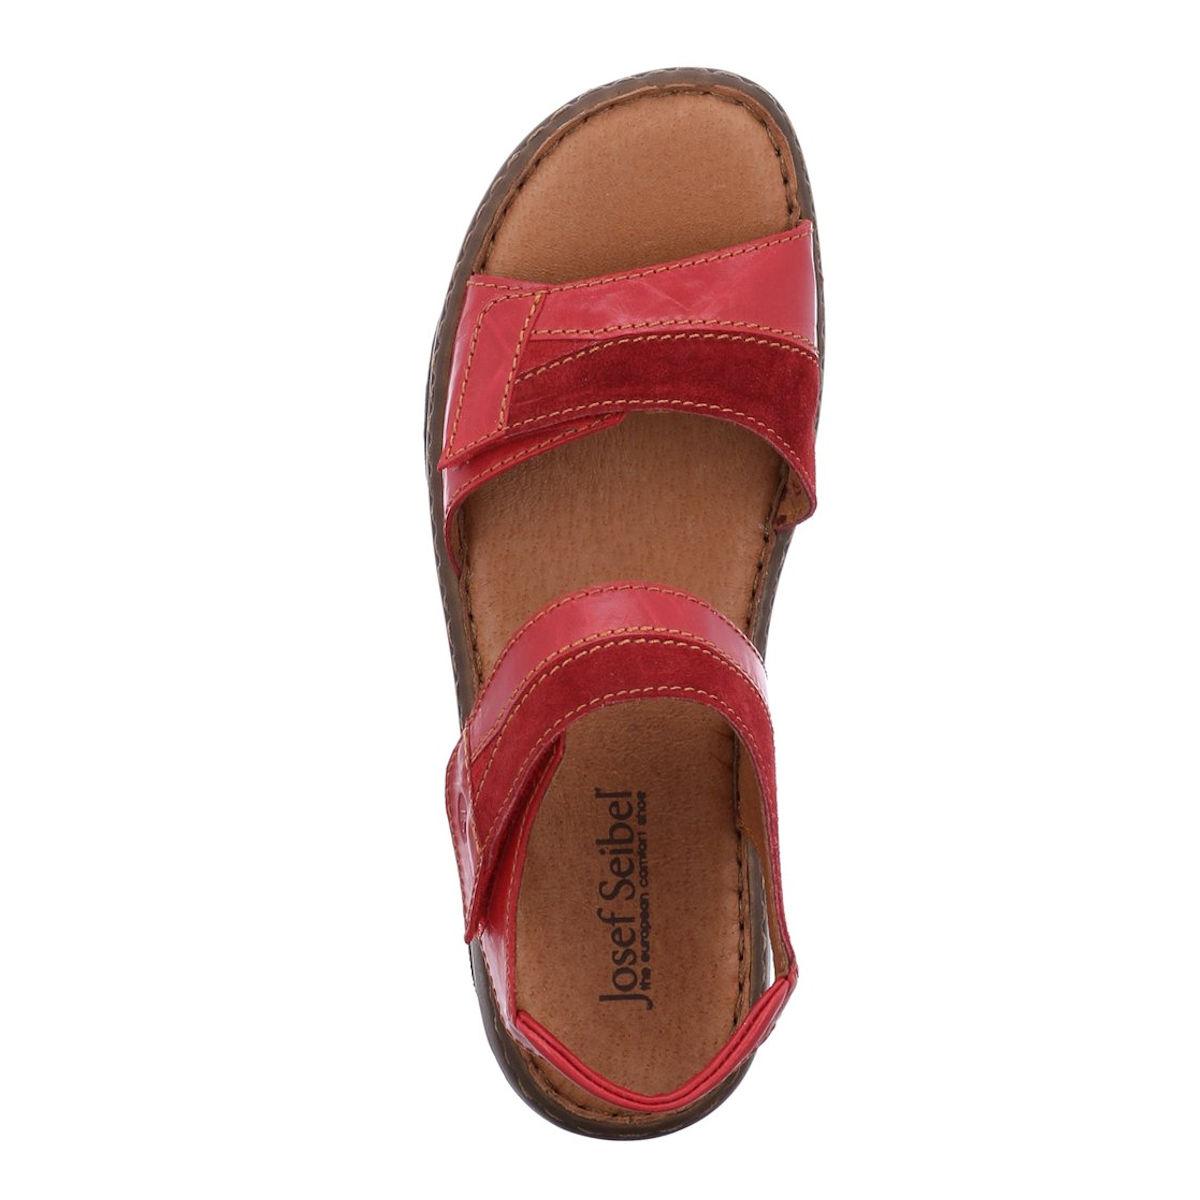 Josef Seibel Debra 19 - Womens Adjustable Red Leather Sandal